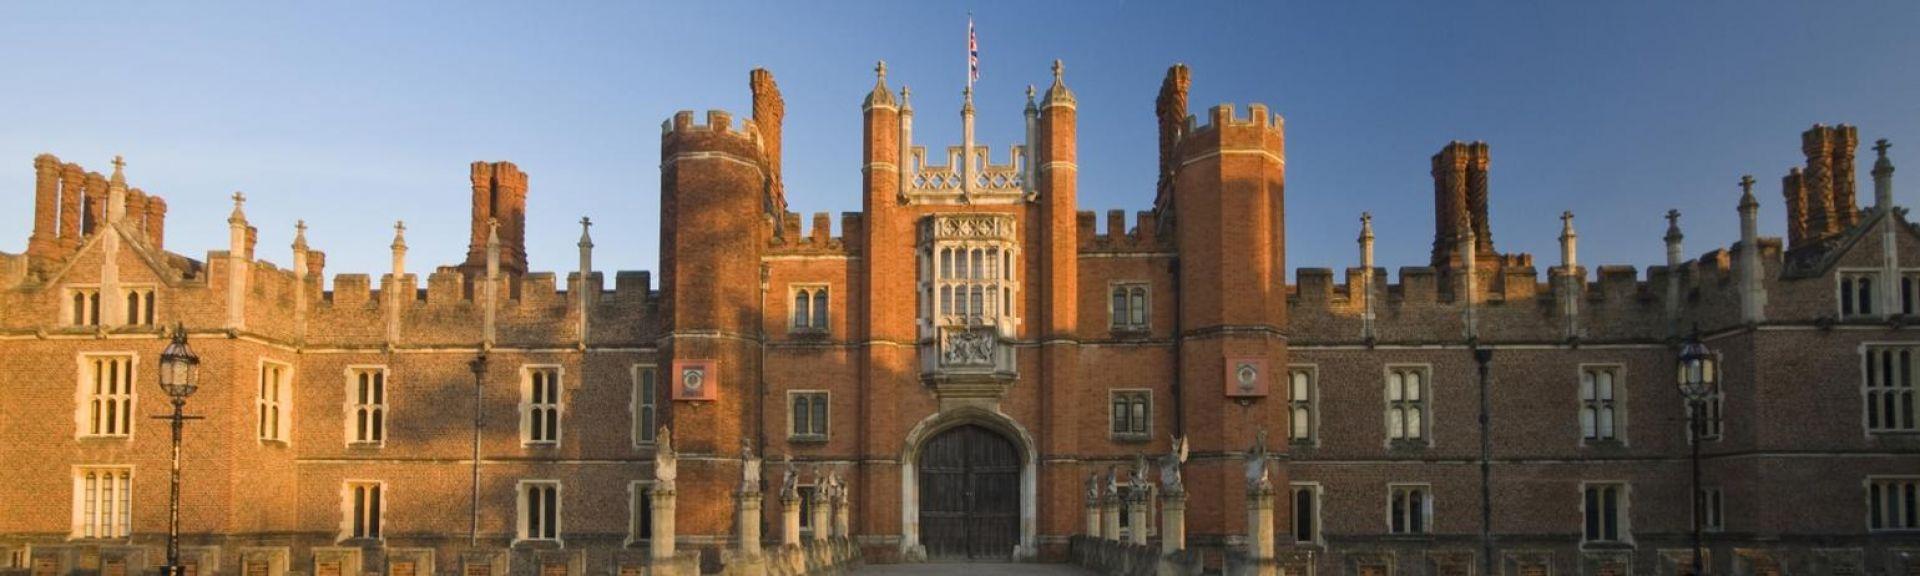 Hampton Court Palace, London | Information | Visit Britain